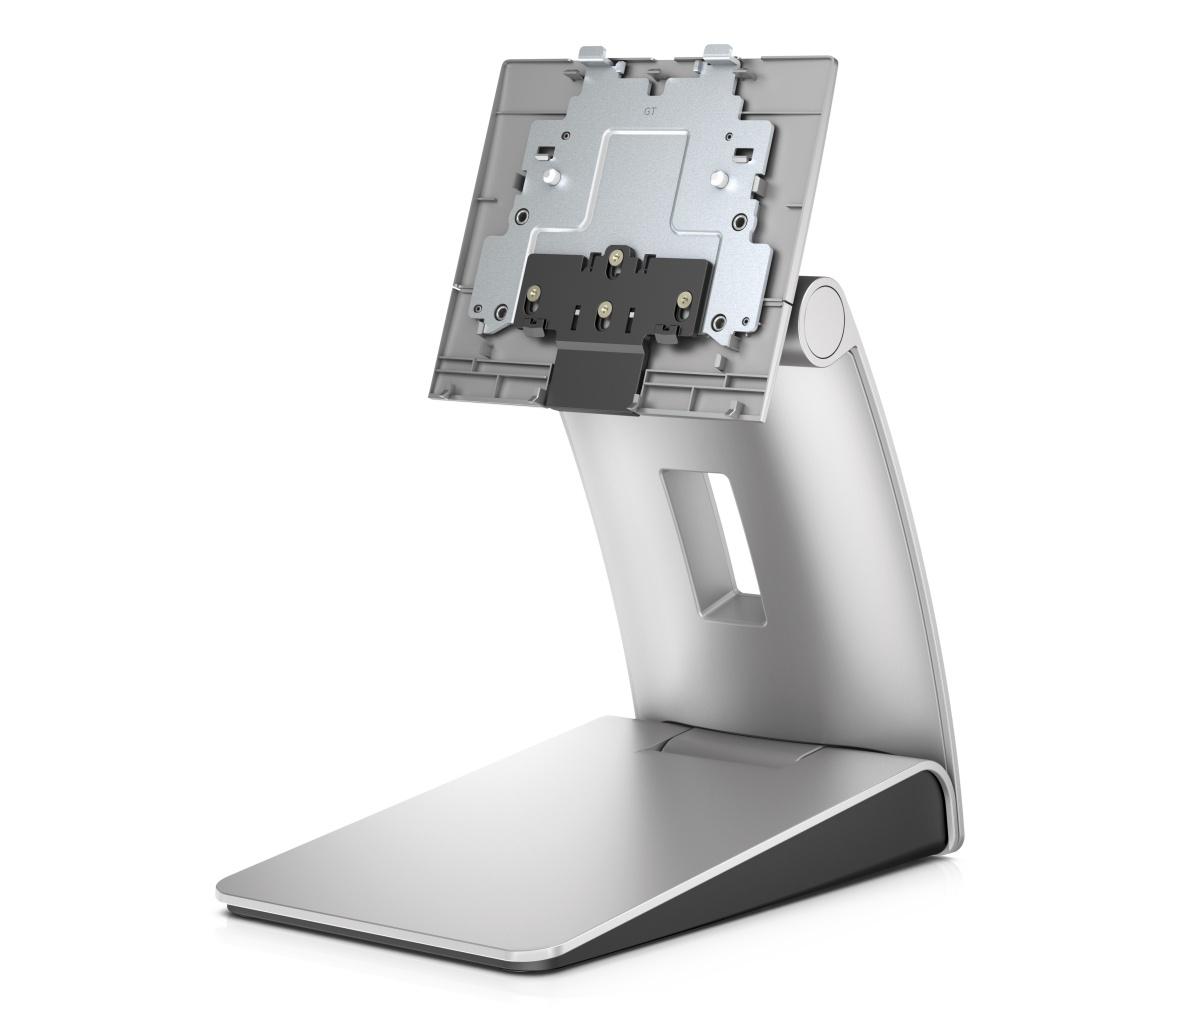 HP 800/705/600 G2 AIO Recline Stand Kit